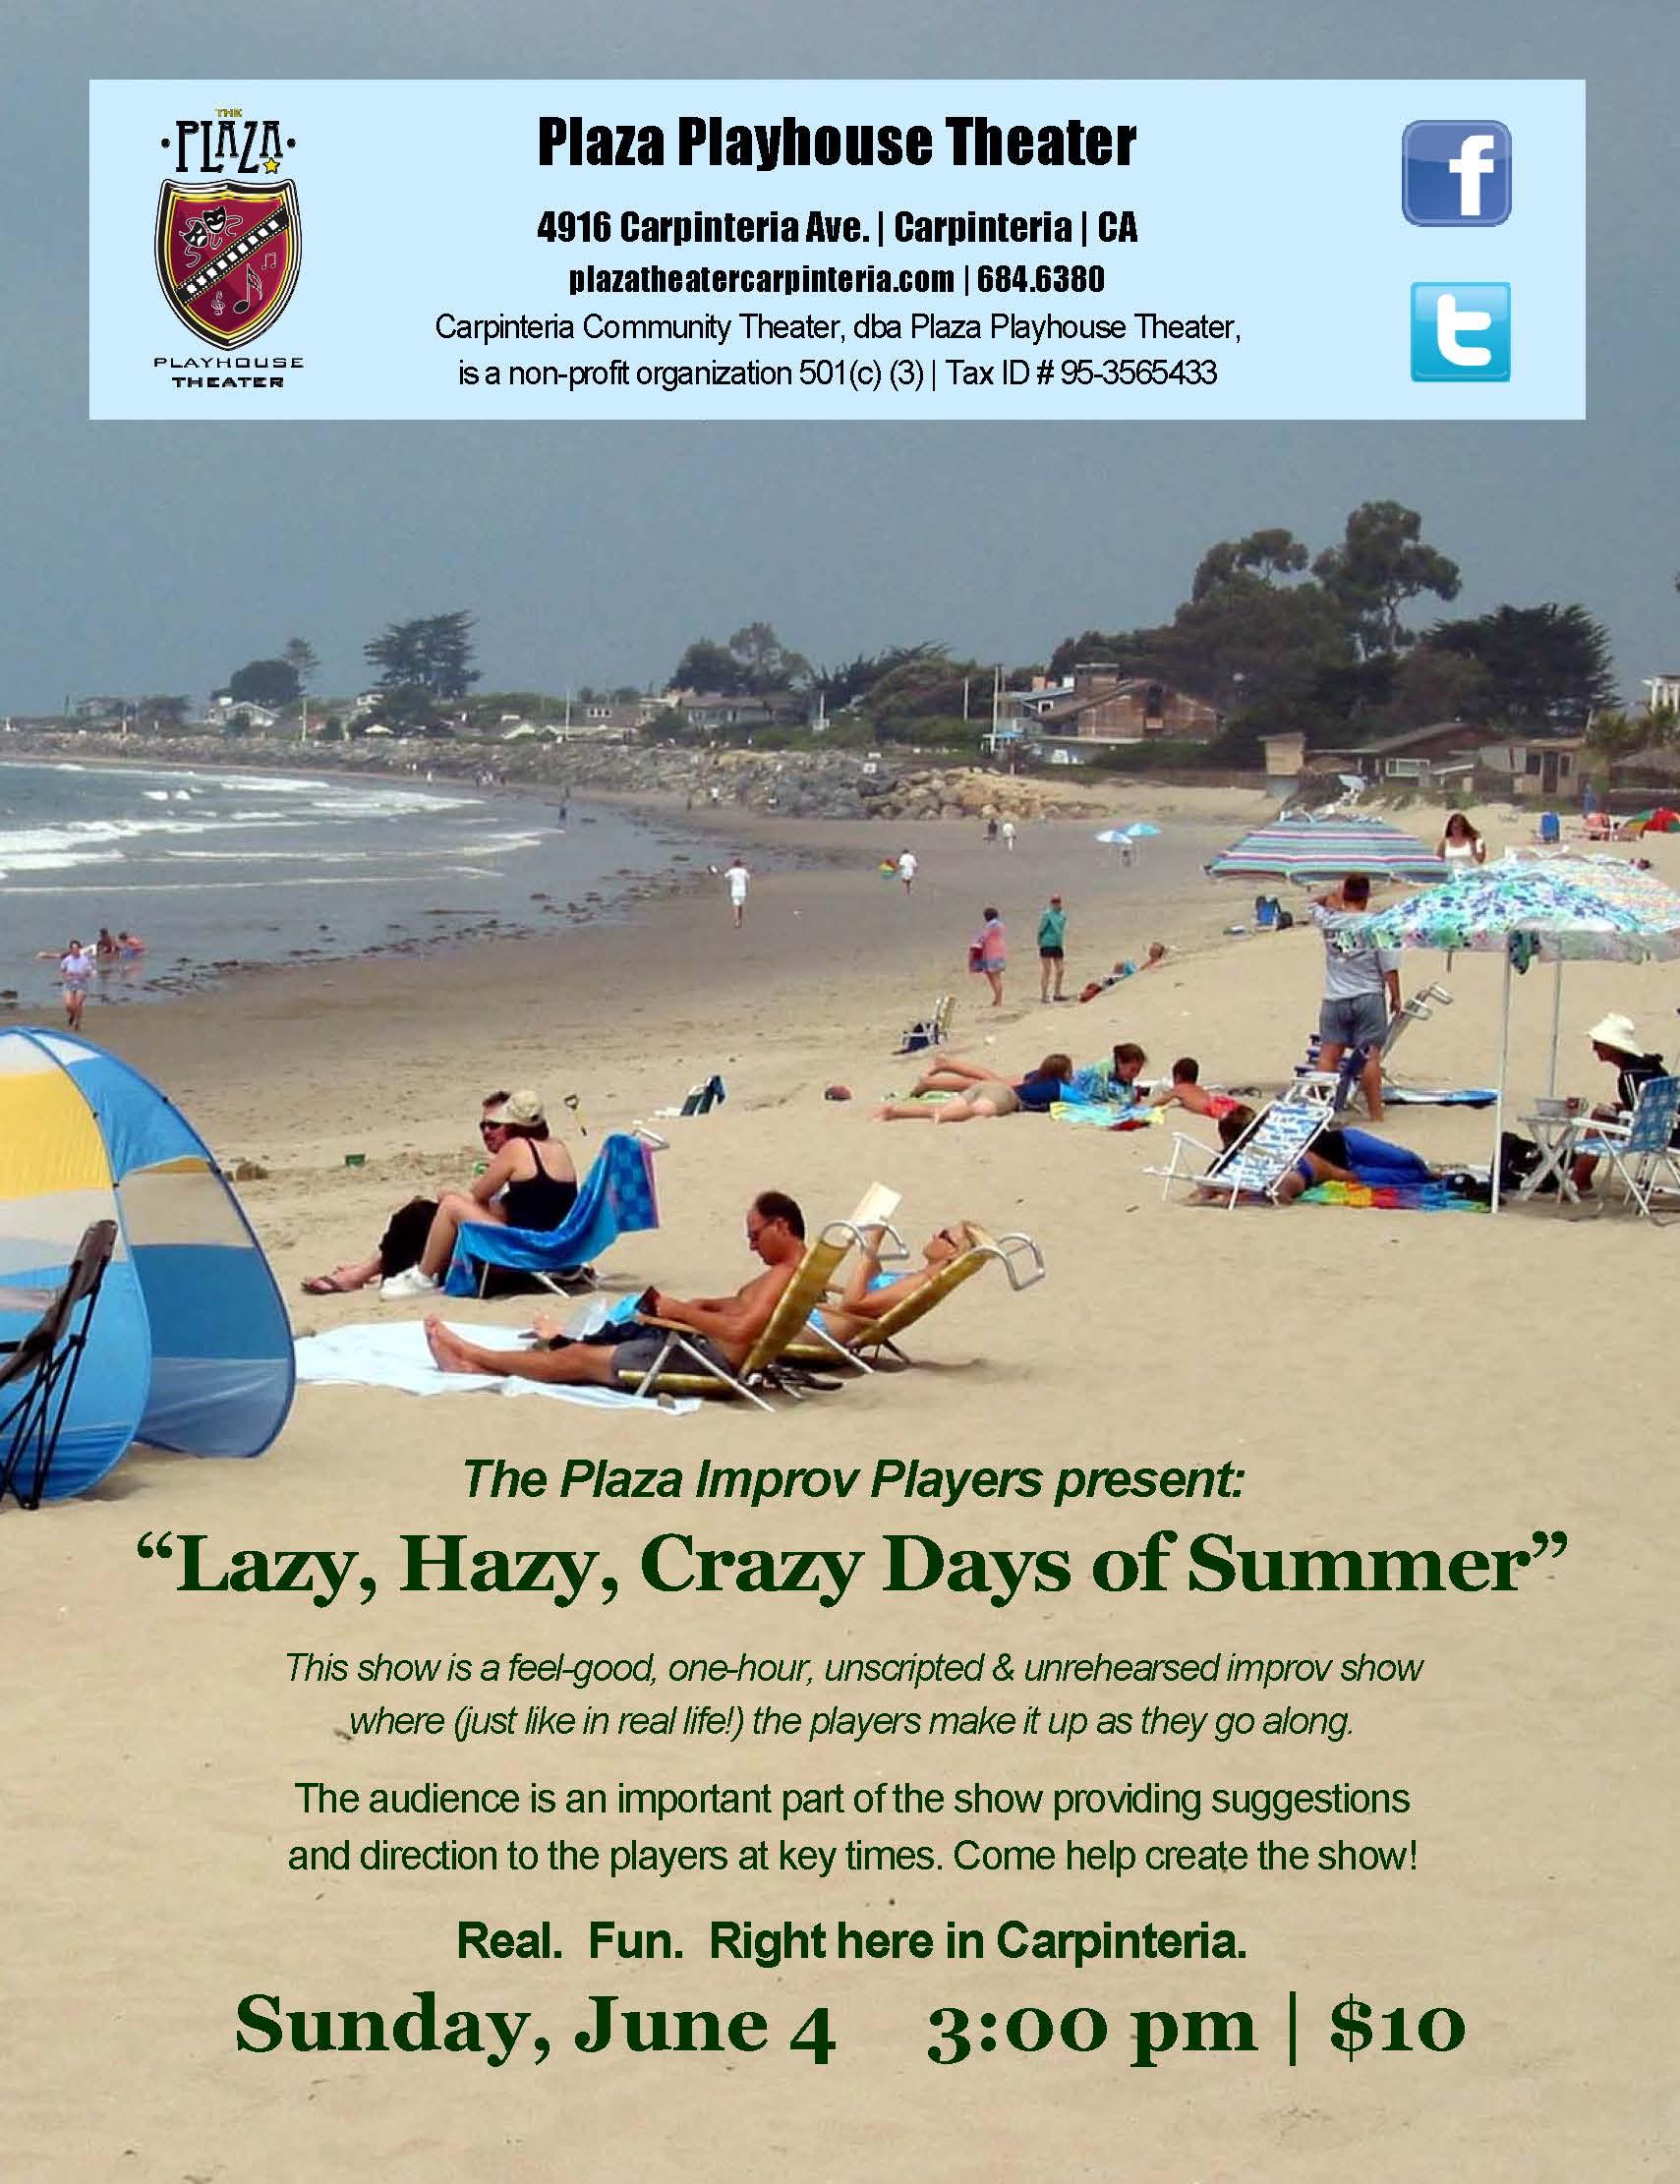 Lazy Hazy Crazy Days of Summer, an improv matinee